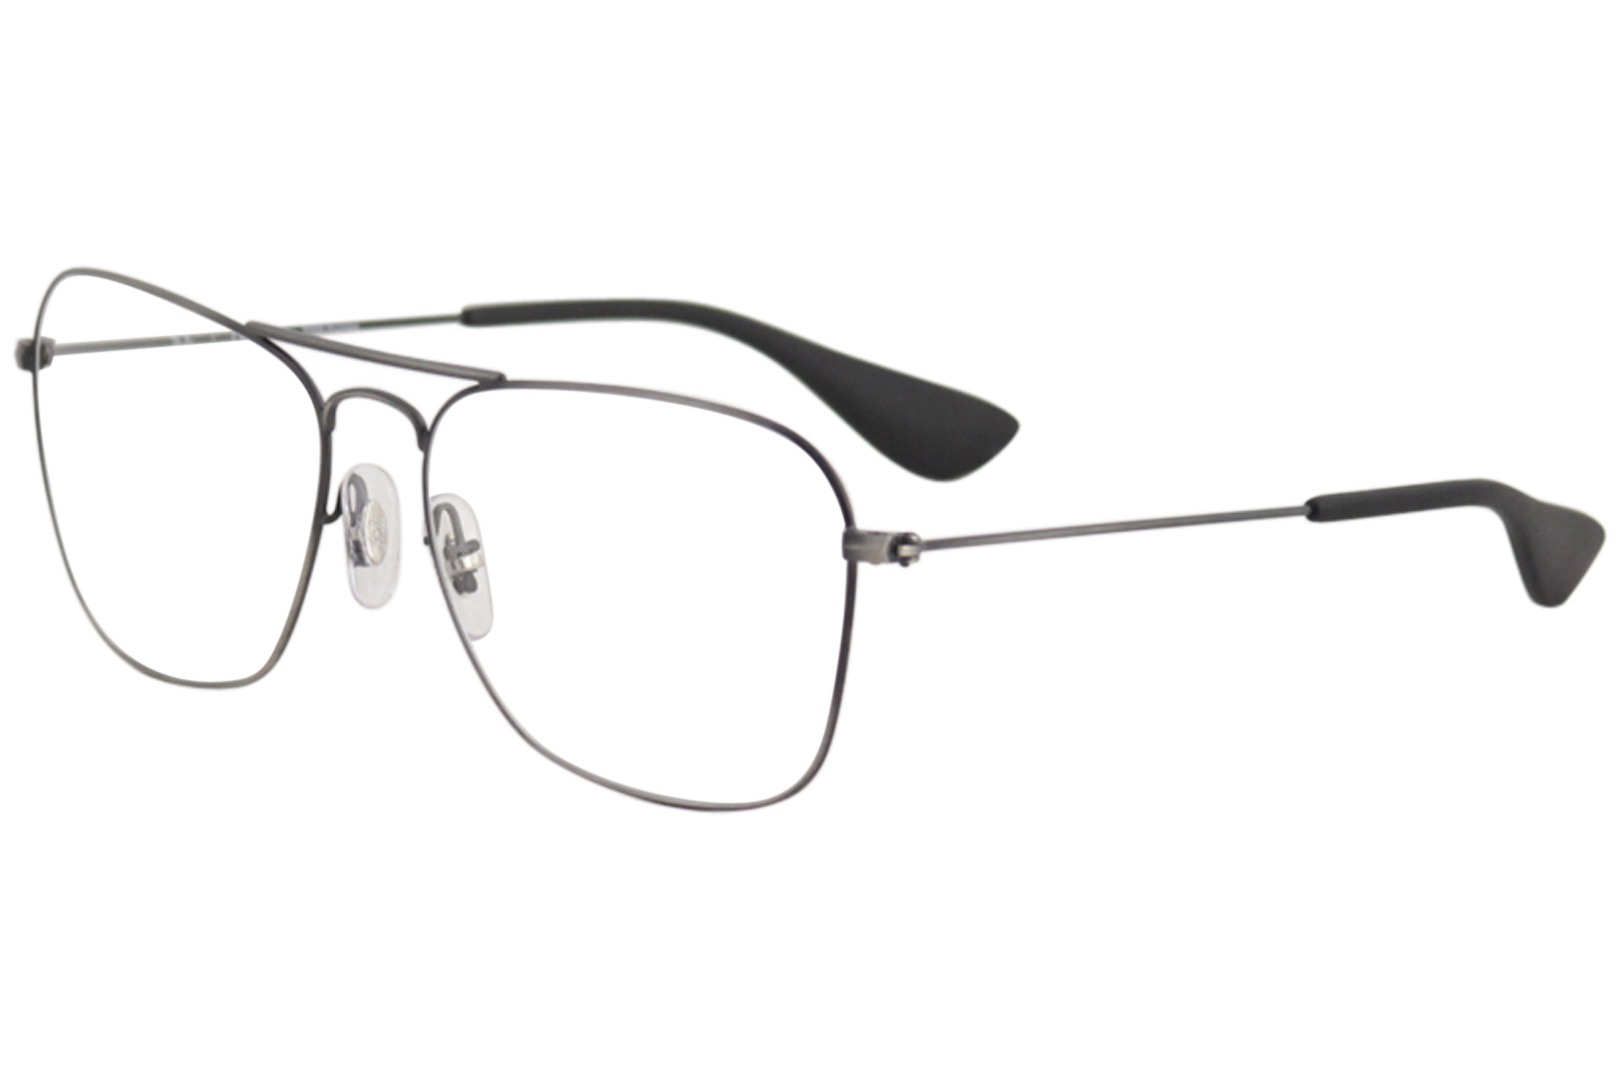 b943d5784f02 Ray Ban Eyeglasses RB3610V RX 3610 V 3032 Matte Black Antique ...